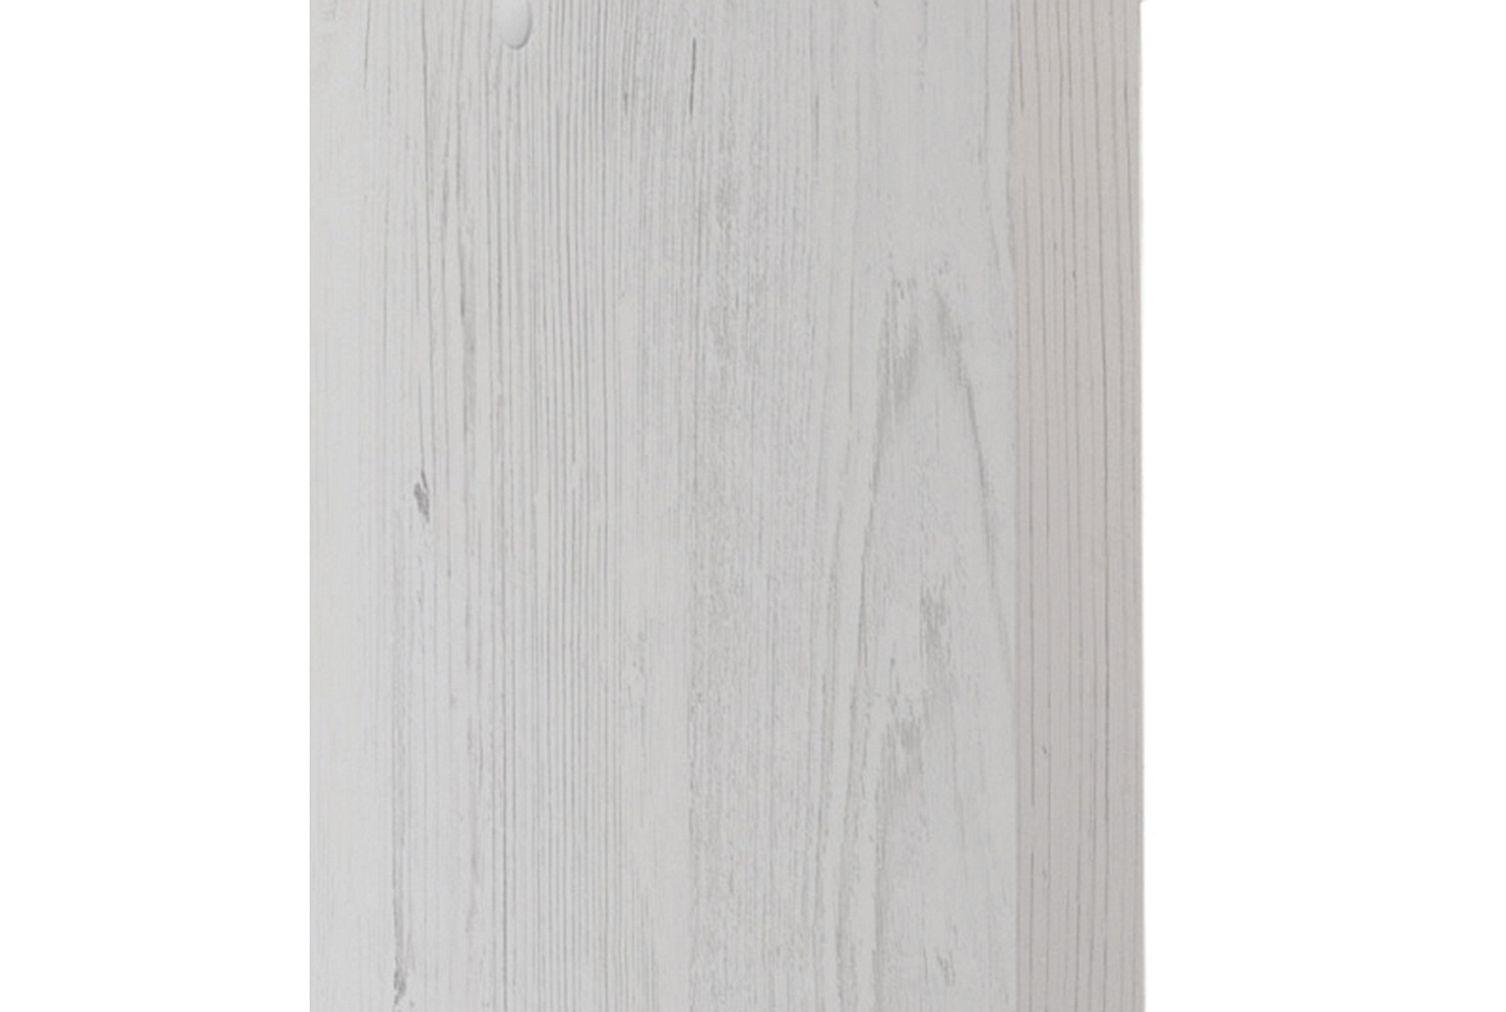 Sitzbank 0585/160 anderson pine